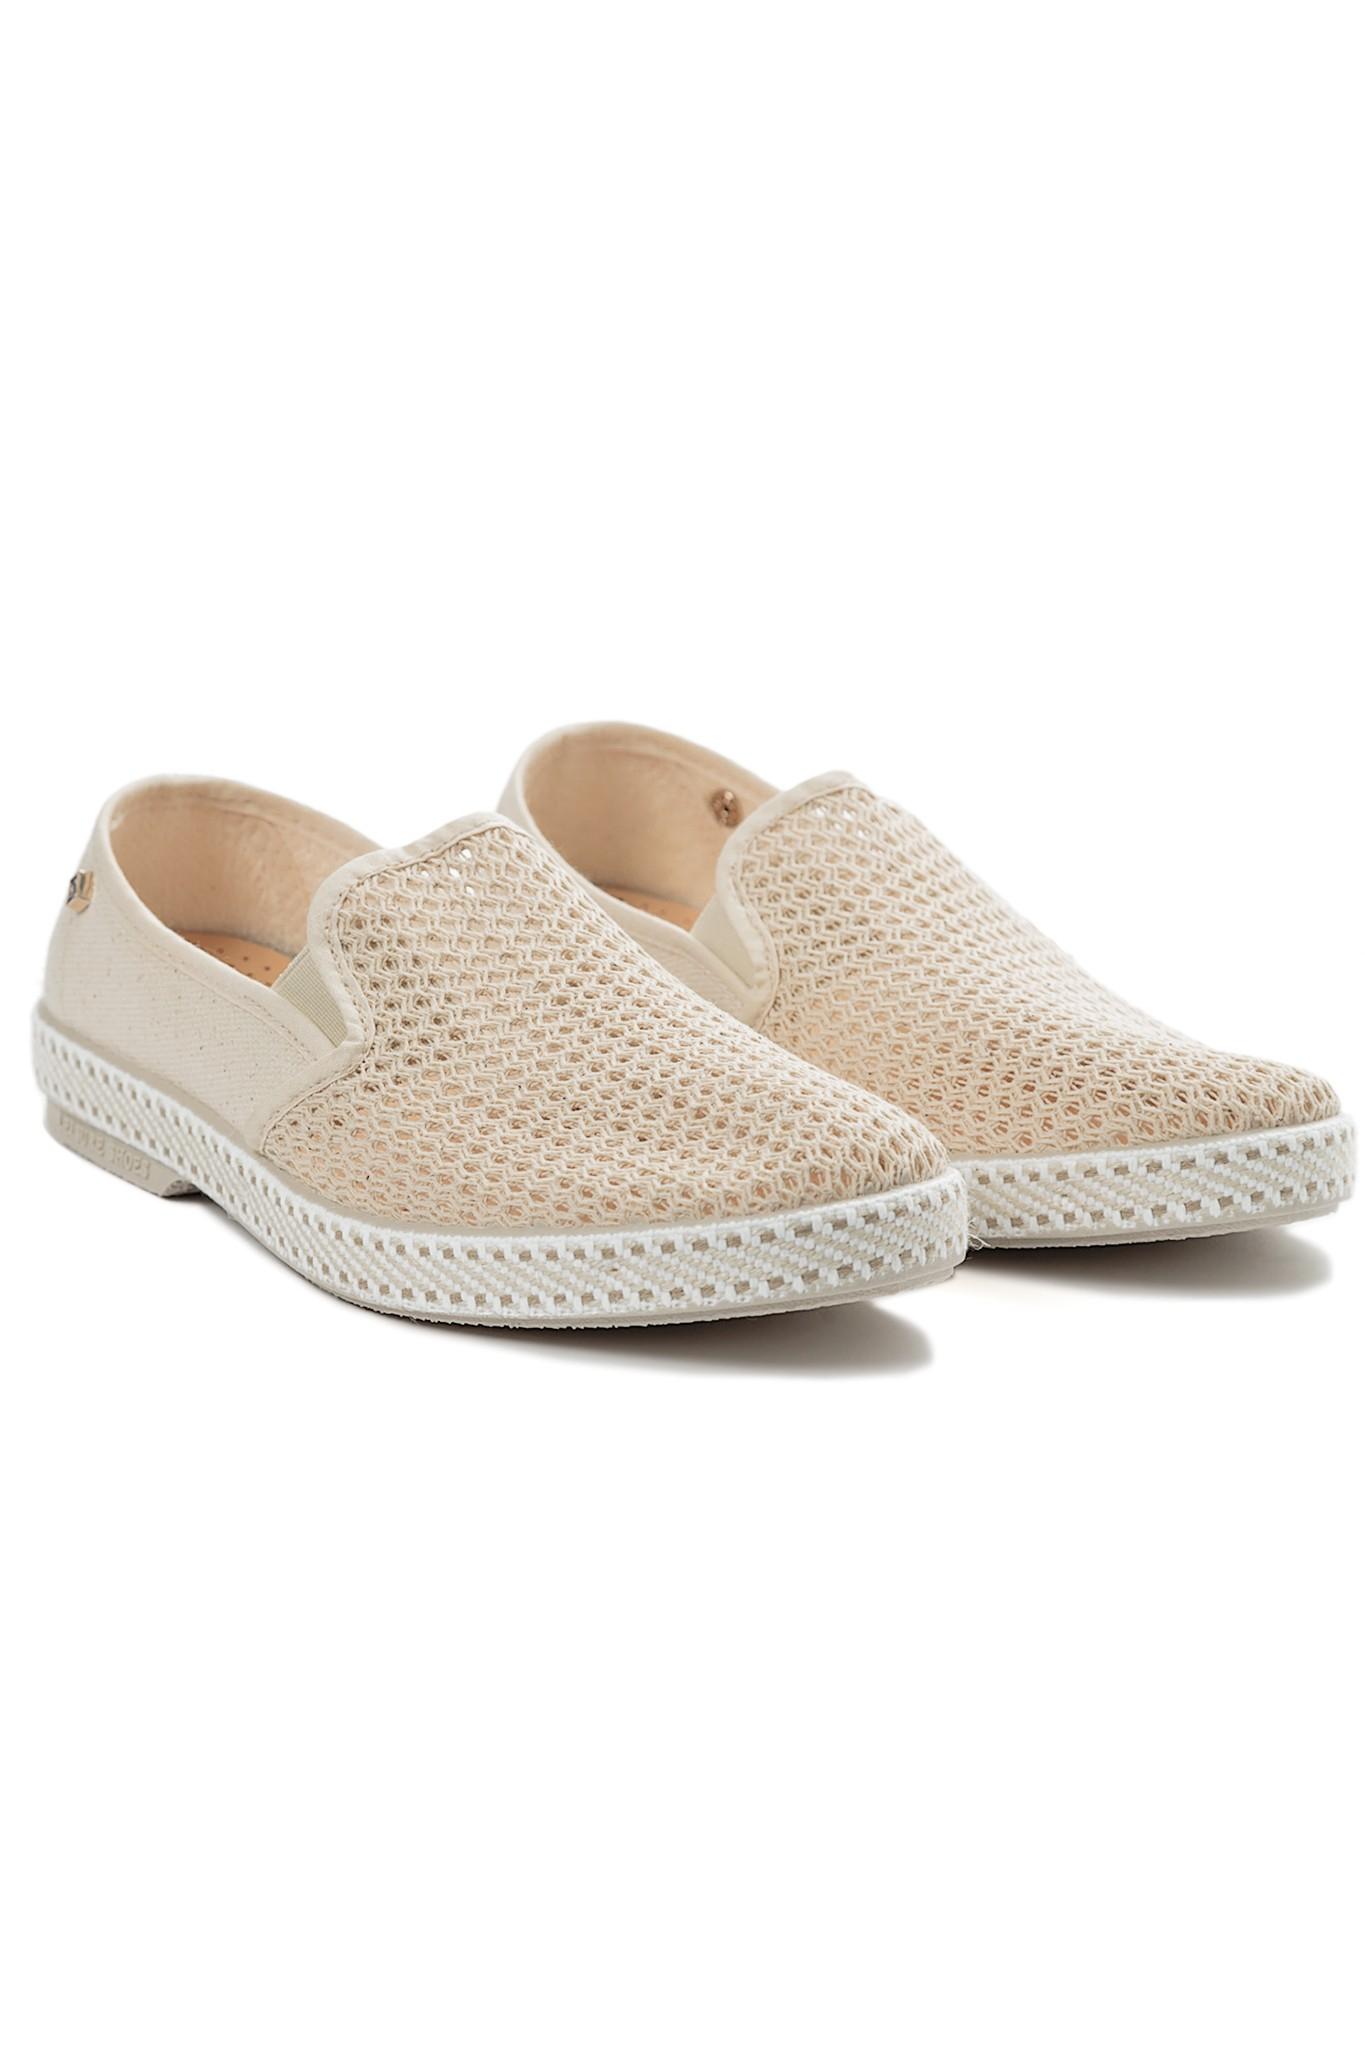 rivieras slip on sneakers in beige lyst